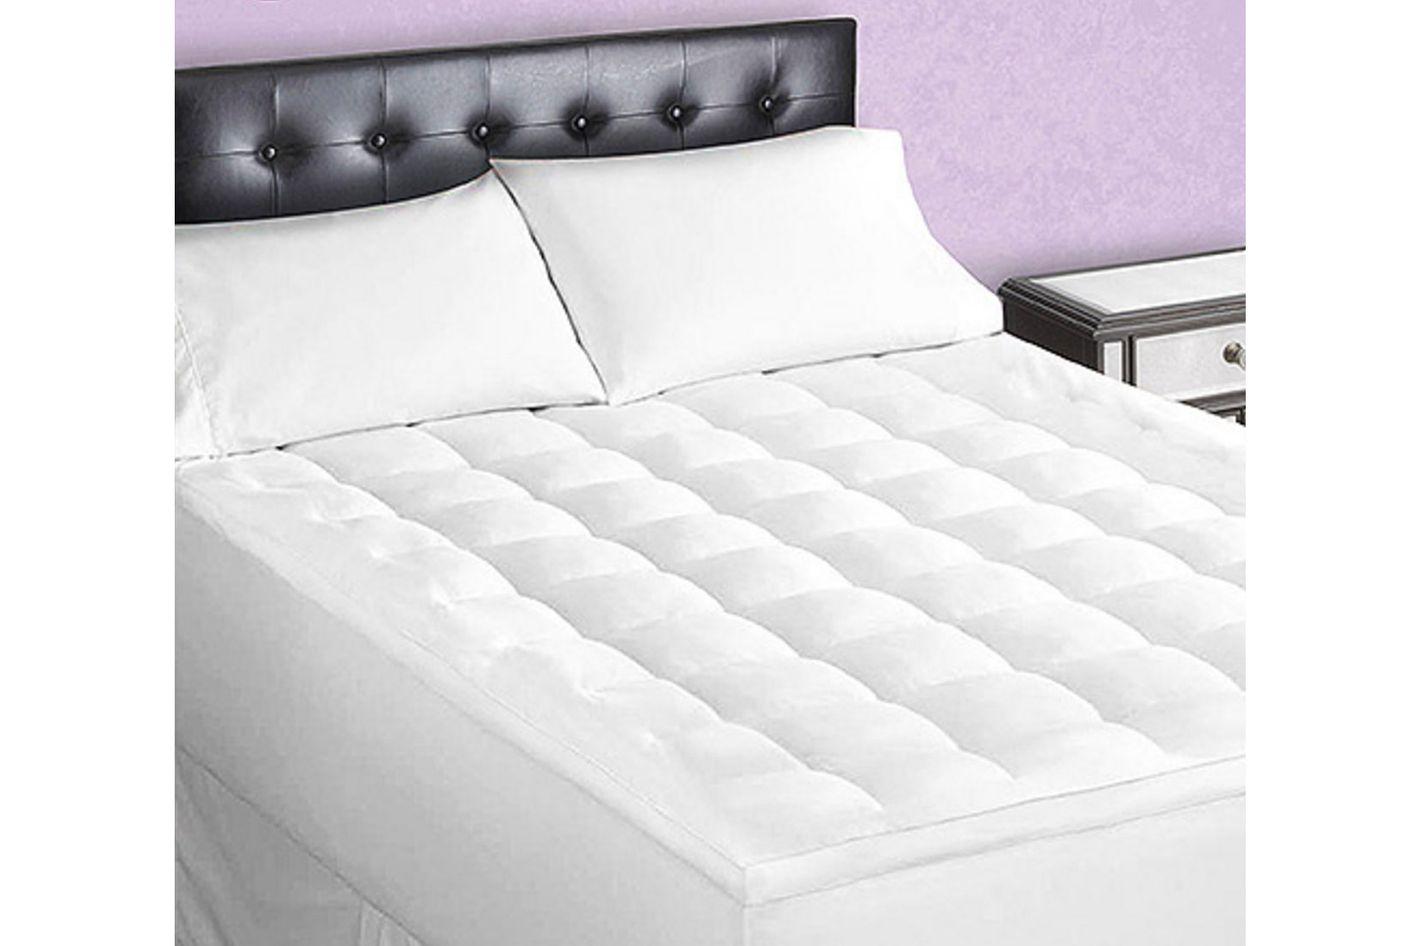 serta superior loft queen down alternative mattress pad sale price 28 30 percent off with code warehouse30 on jet